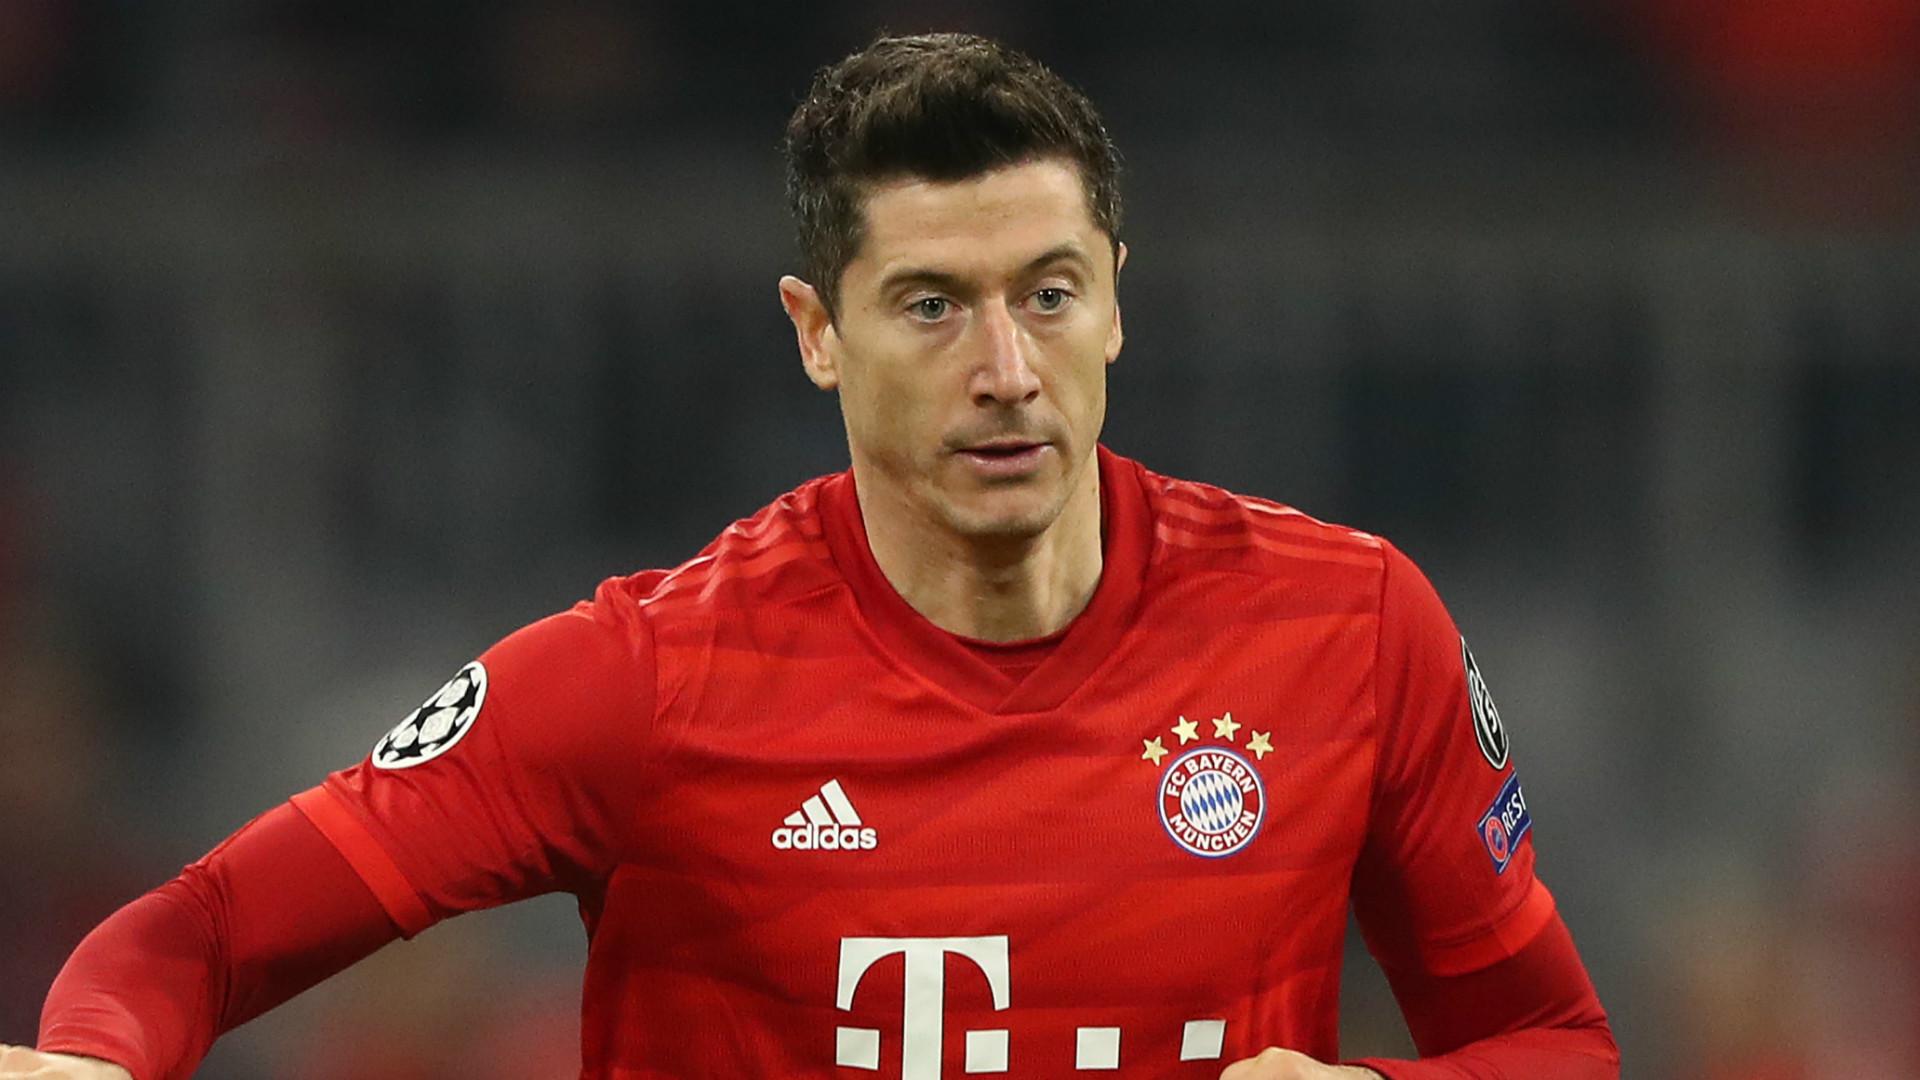 Bayern striker Lewandowski discusses failed Real Madrid move